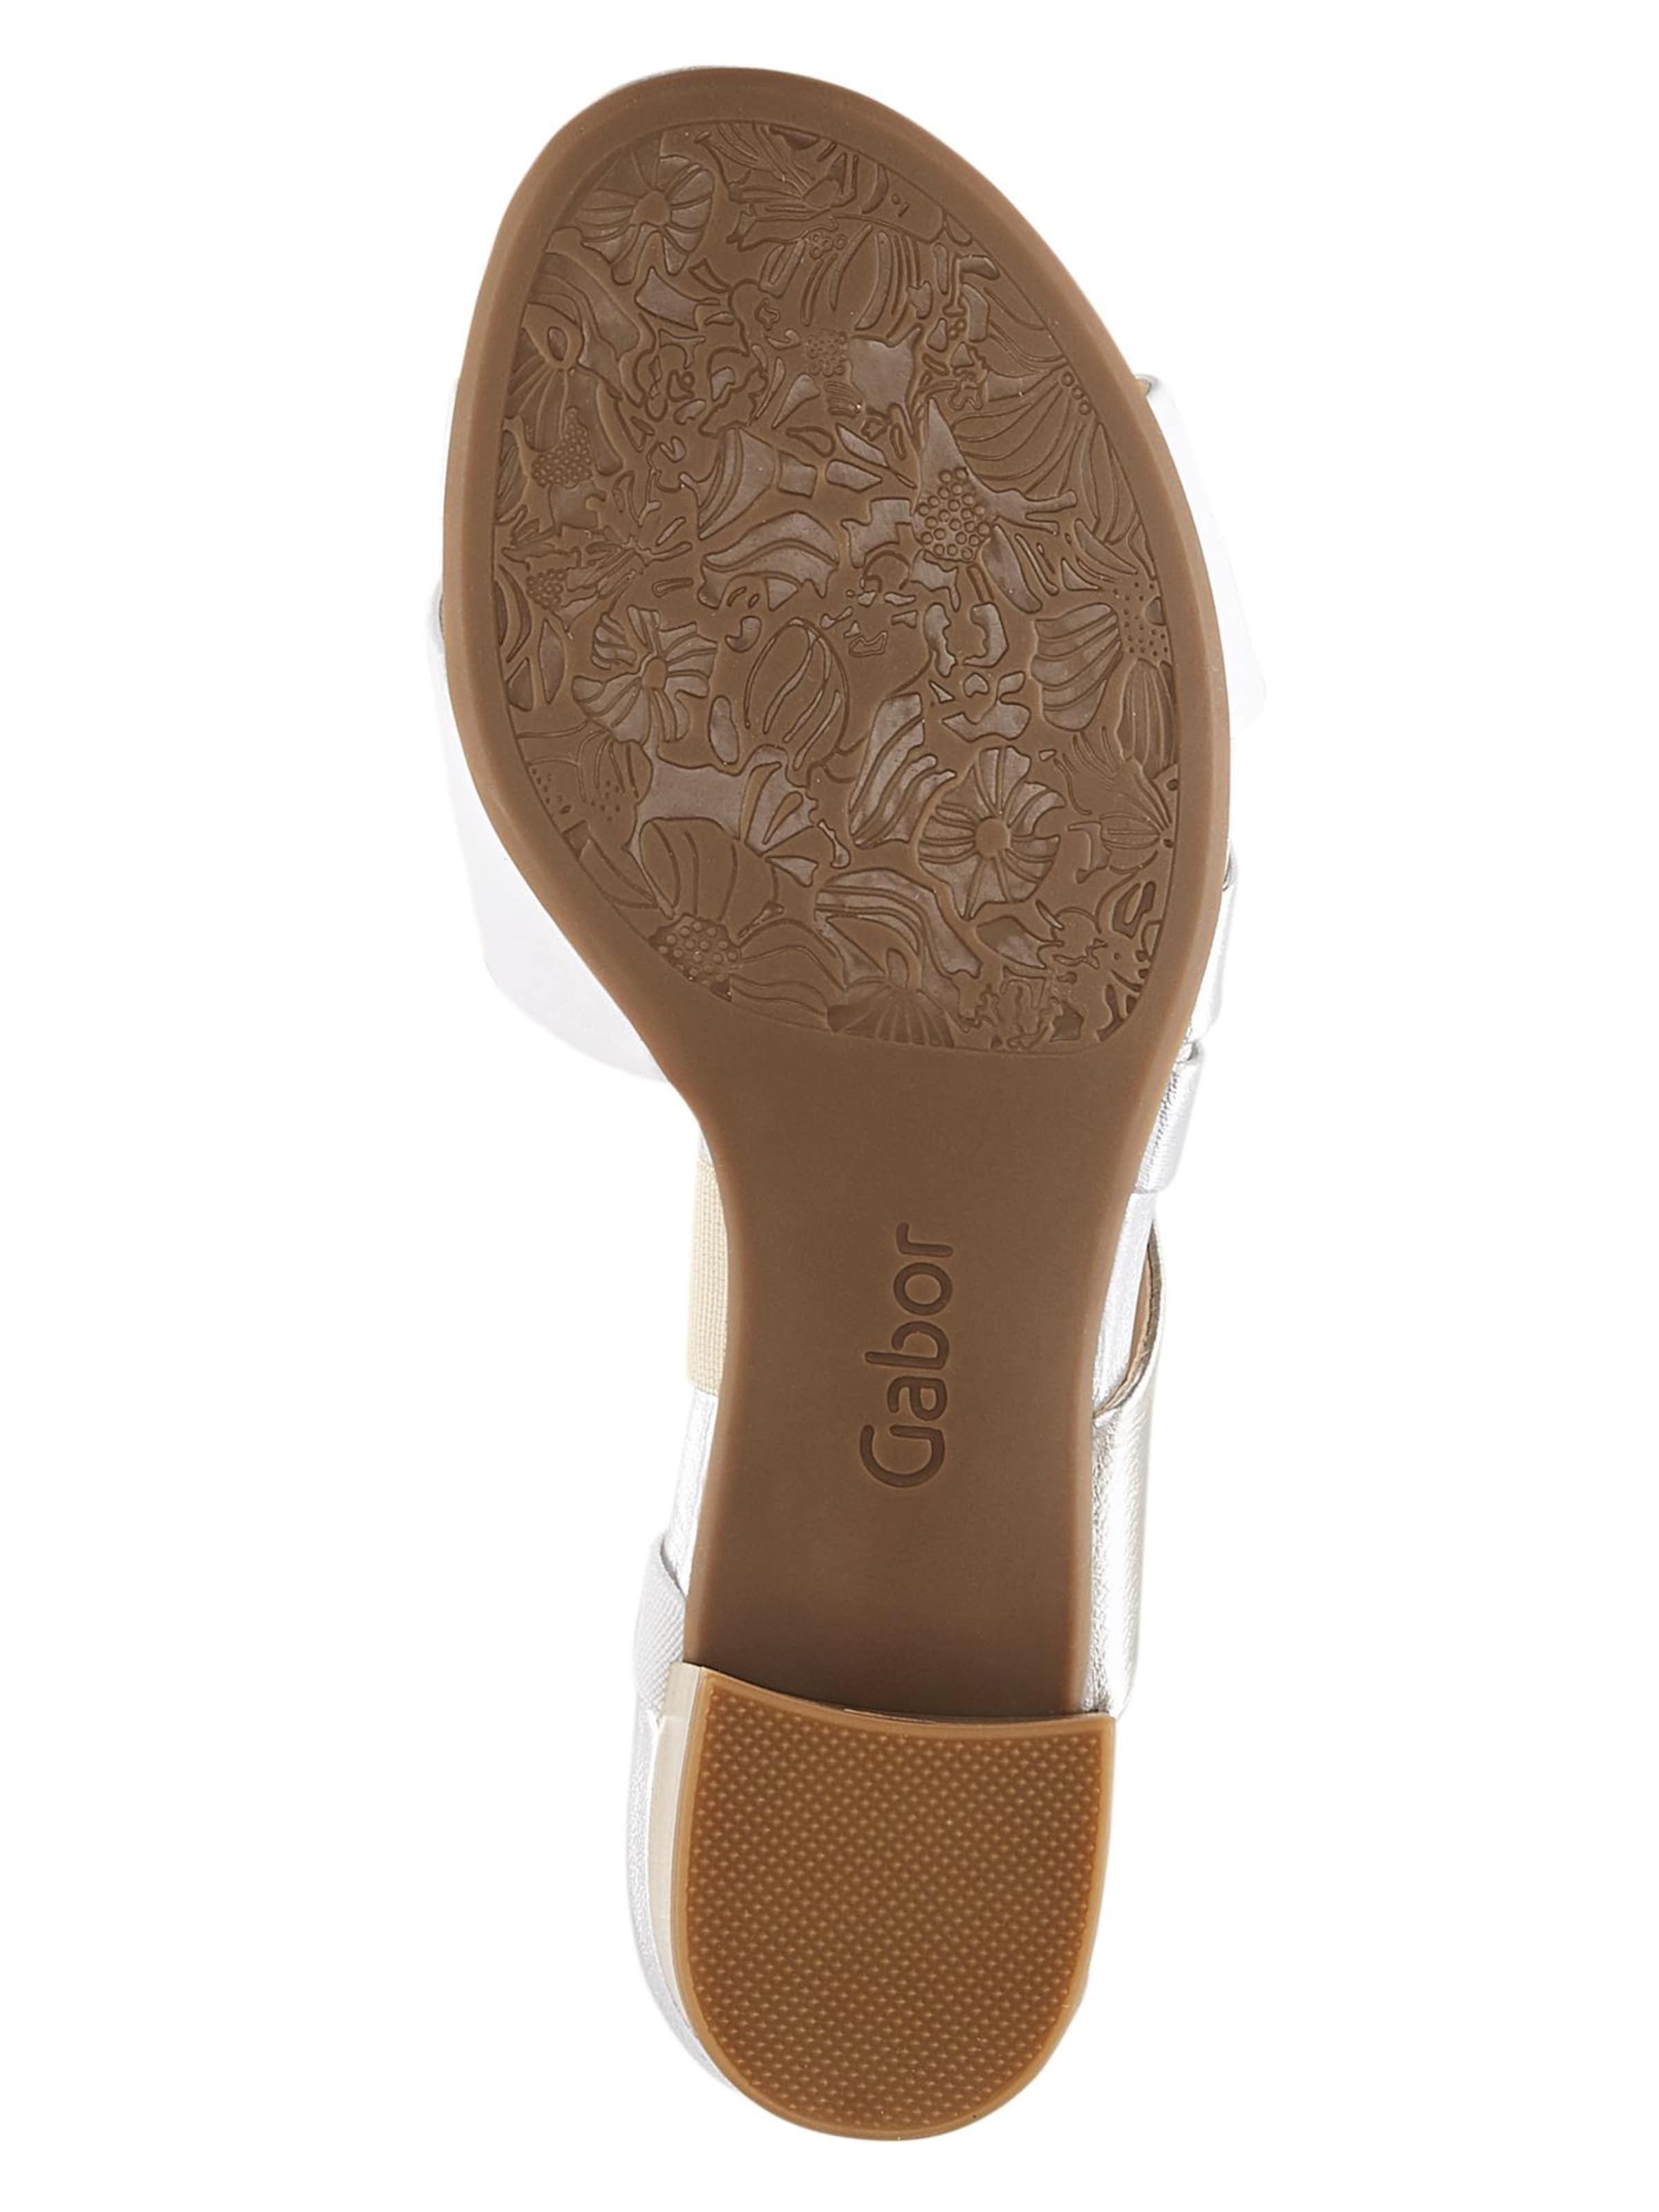 Weiß GoldSilber Gabor Gabor Sandalette In trCshQdx